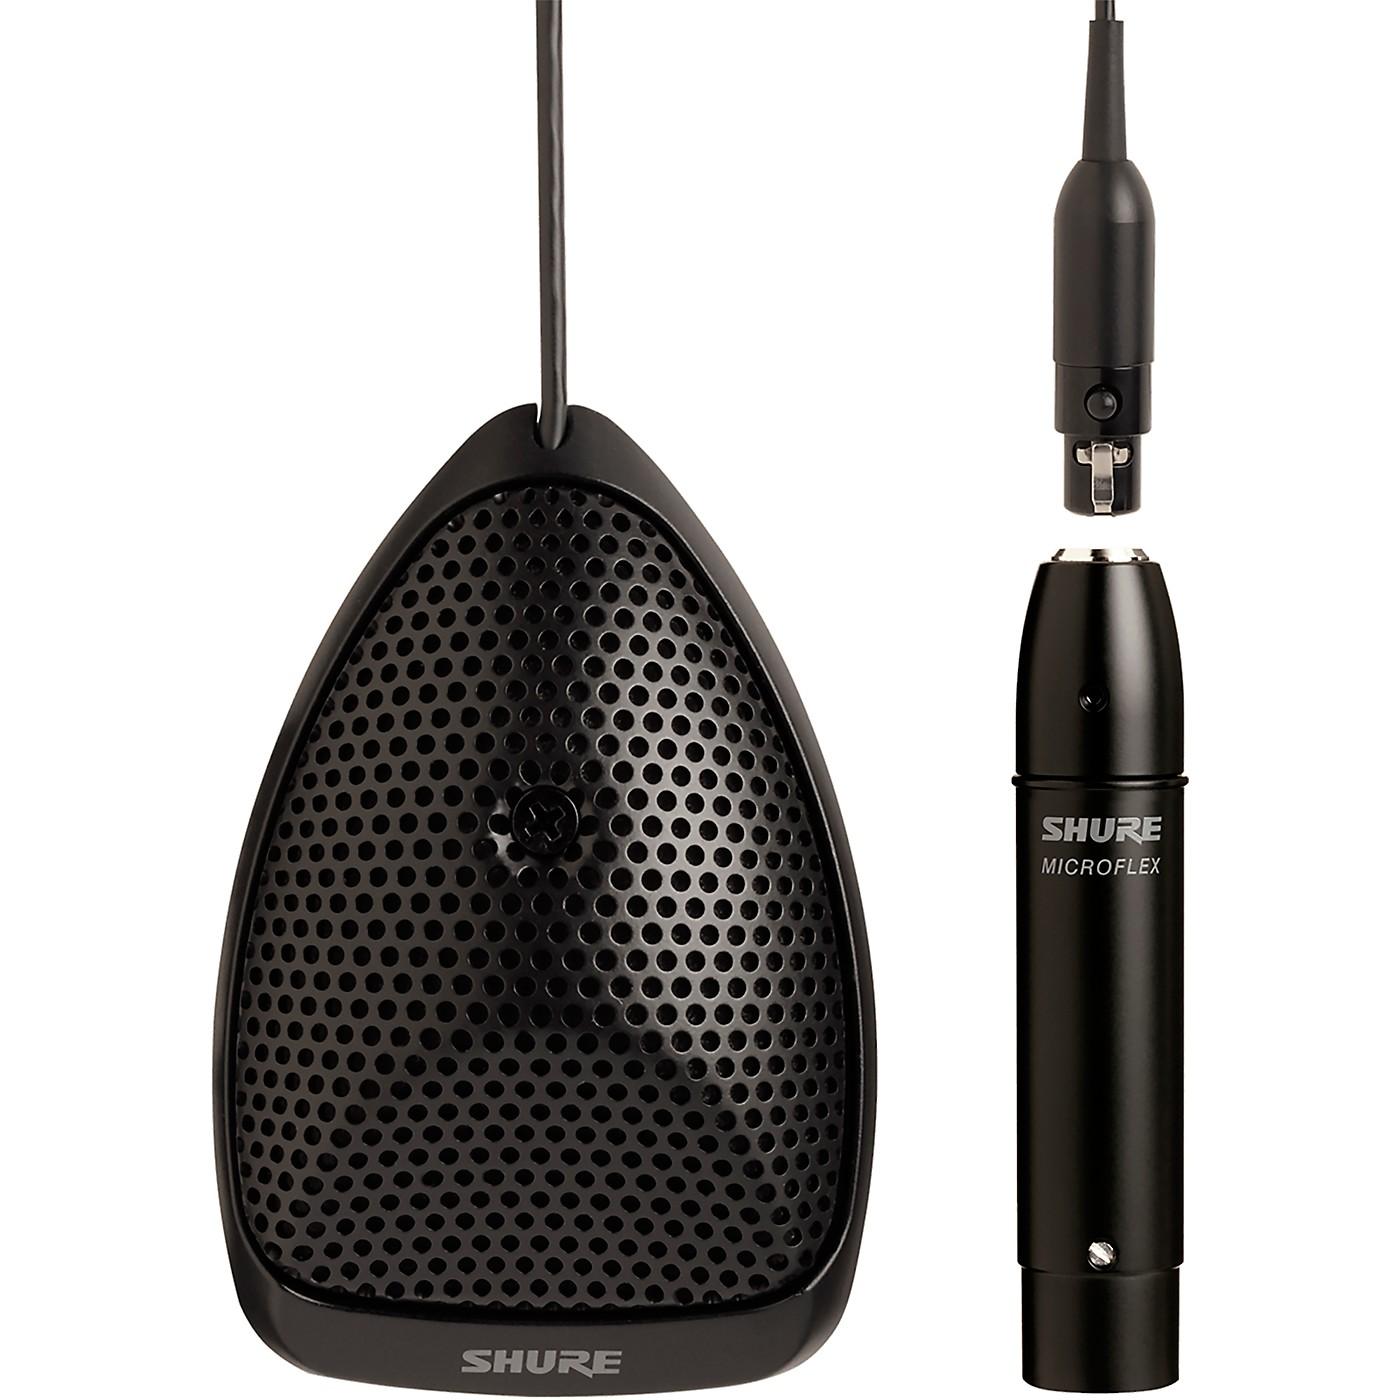 Shure MX391/C Microflex Omnidirectional Boundary Microphone Cardioid thumbnail